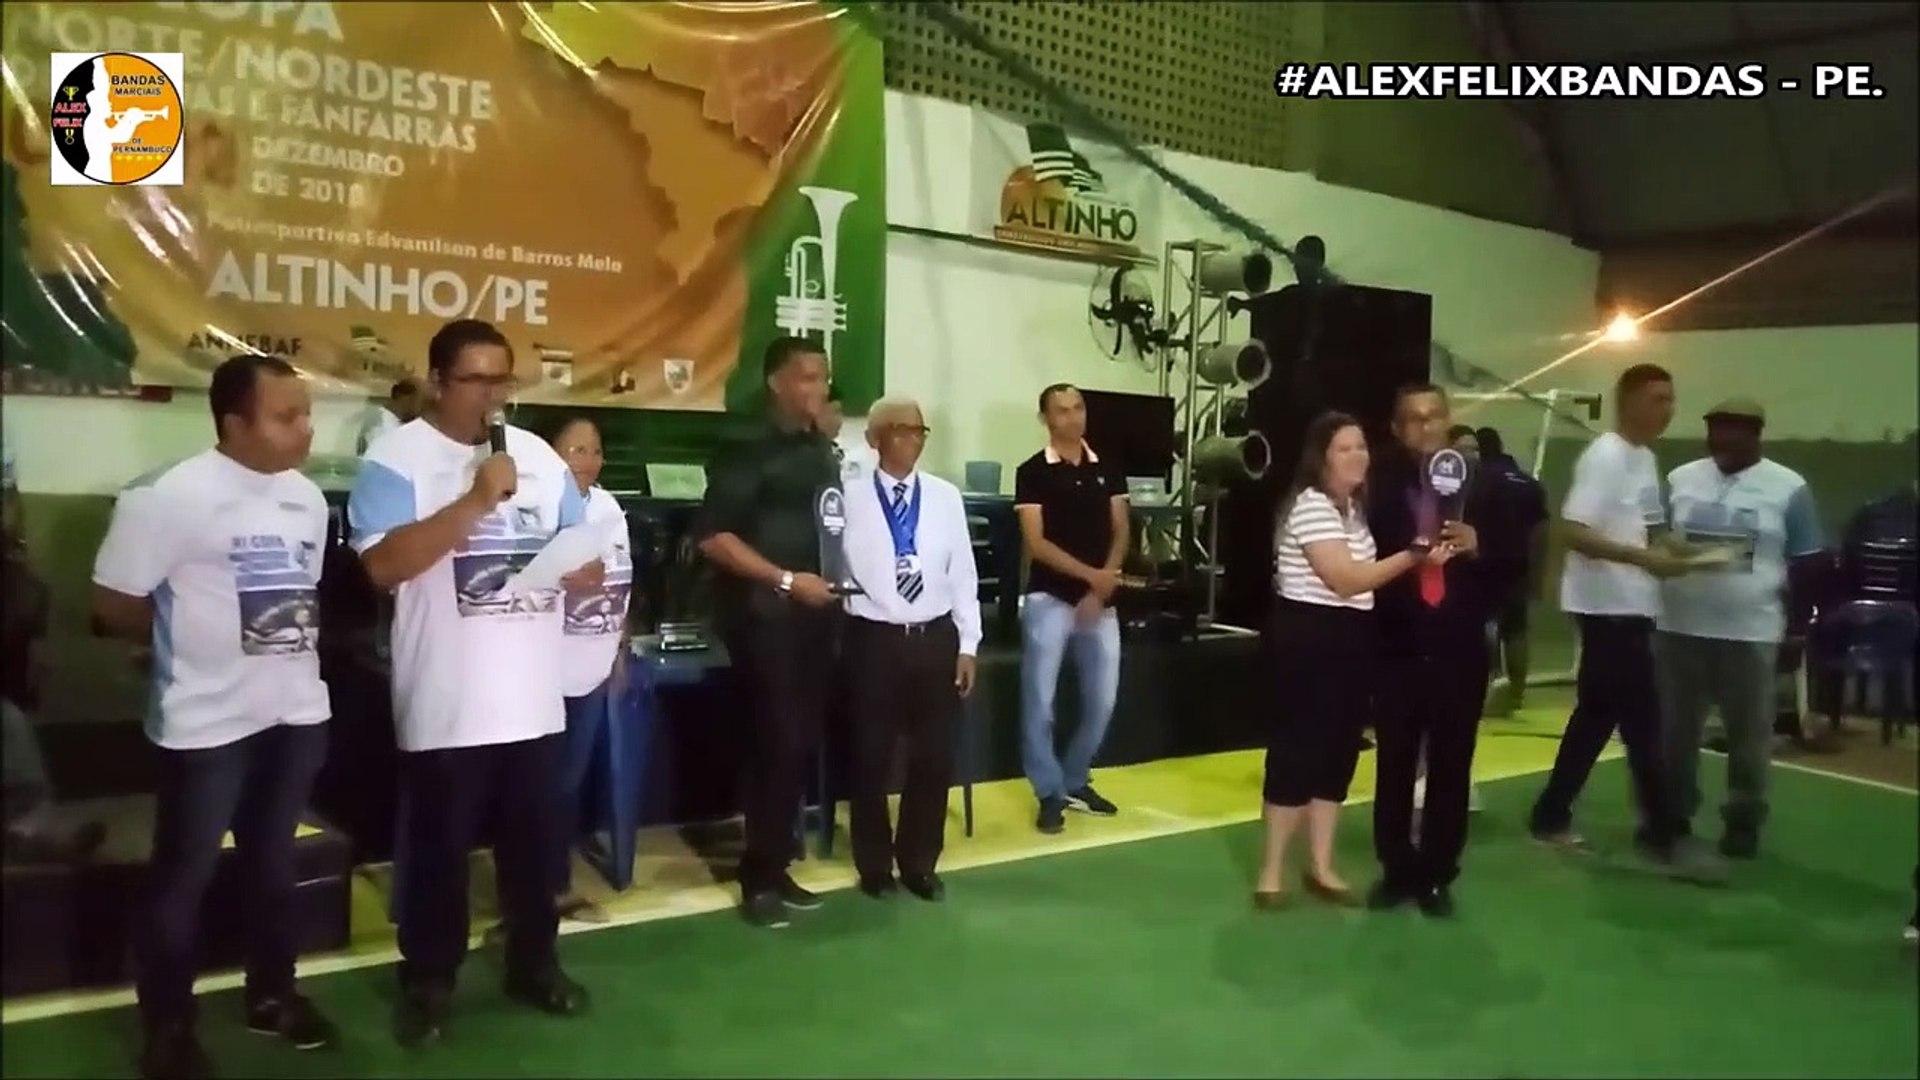 RESULTADO BANDA SHOW 2018 - XI COPA NORDESTE NORTE DE BANDAS E FANFARRAS - ALTINHO - PERNAMBUCO